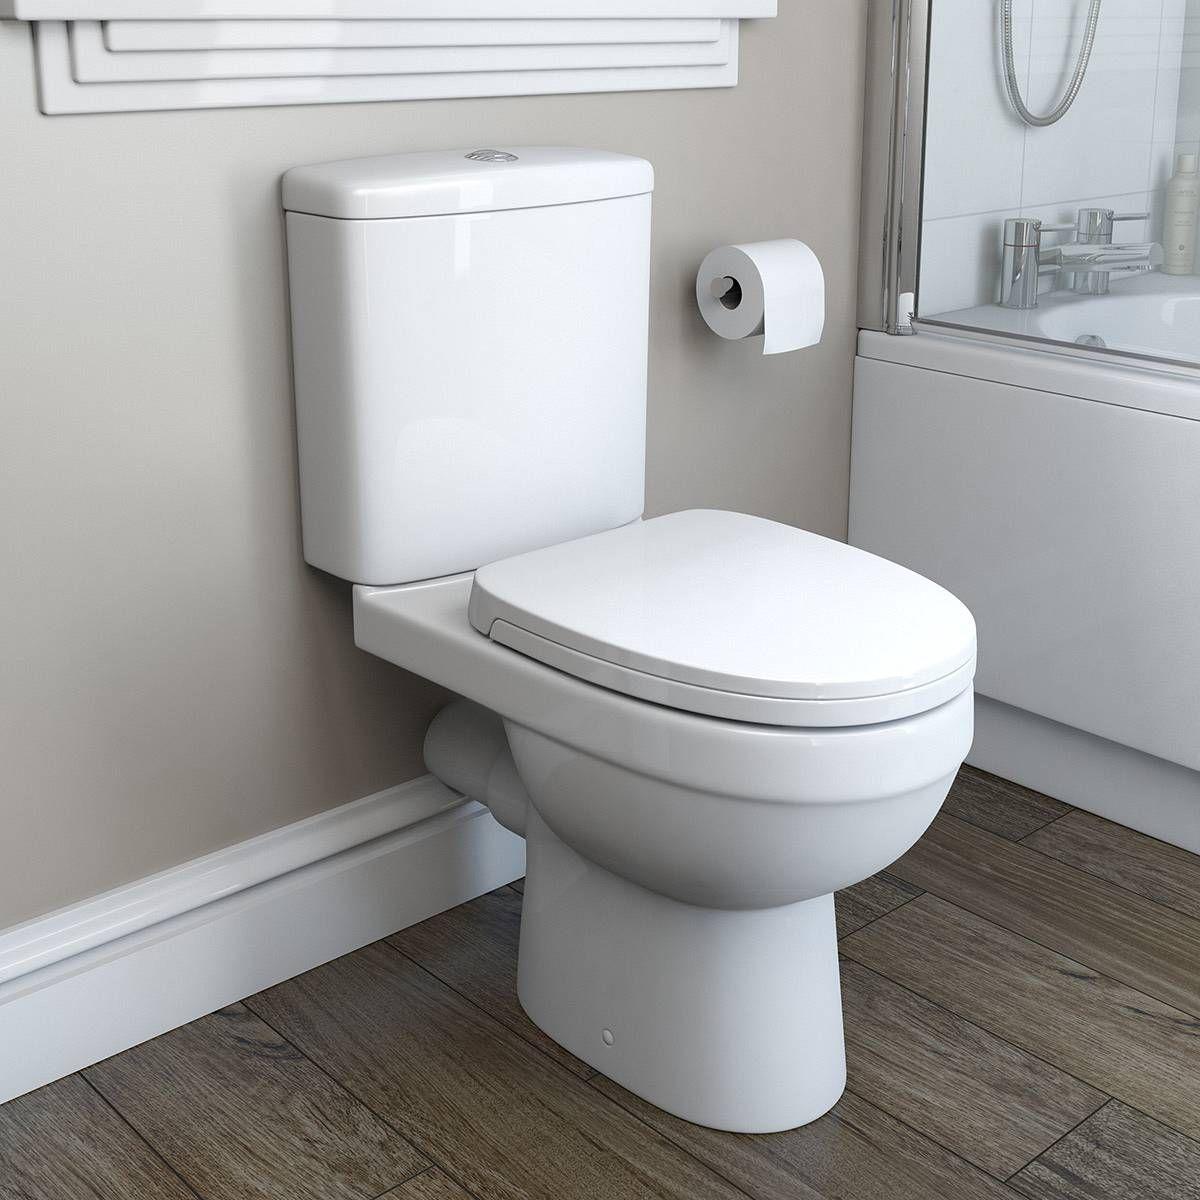 Energy Close Coupled Toilet inc Soft Close Seat PLUS Pushfit Service Valve  Victoria Plumb. The Energy close coupled toilet is a space saving short projection